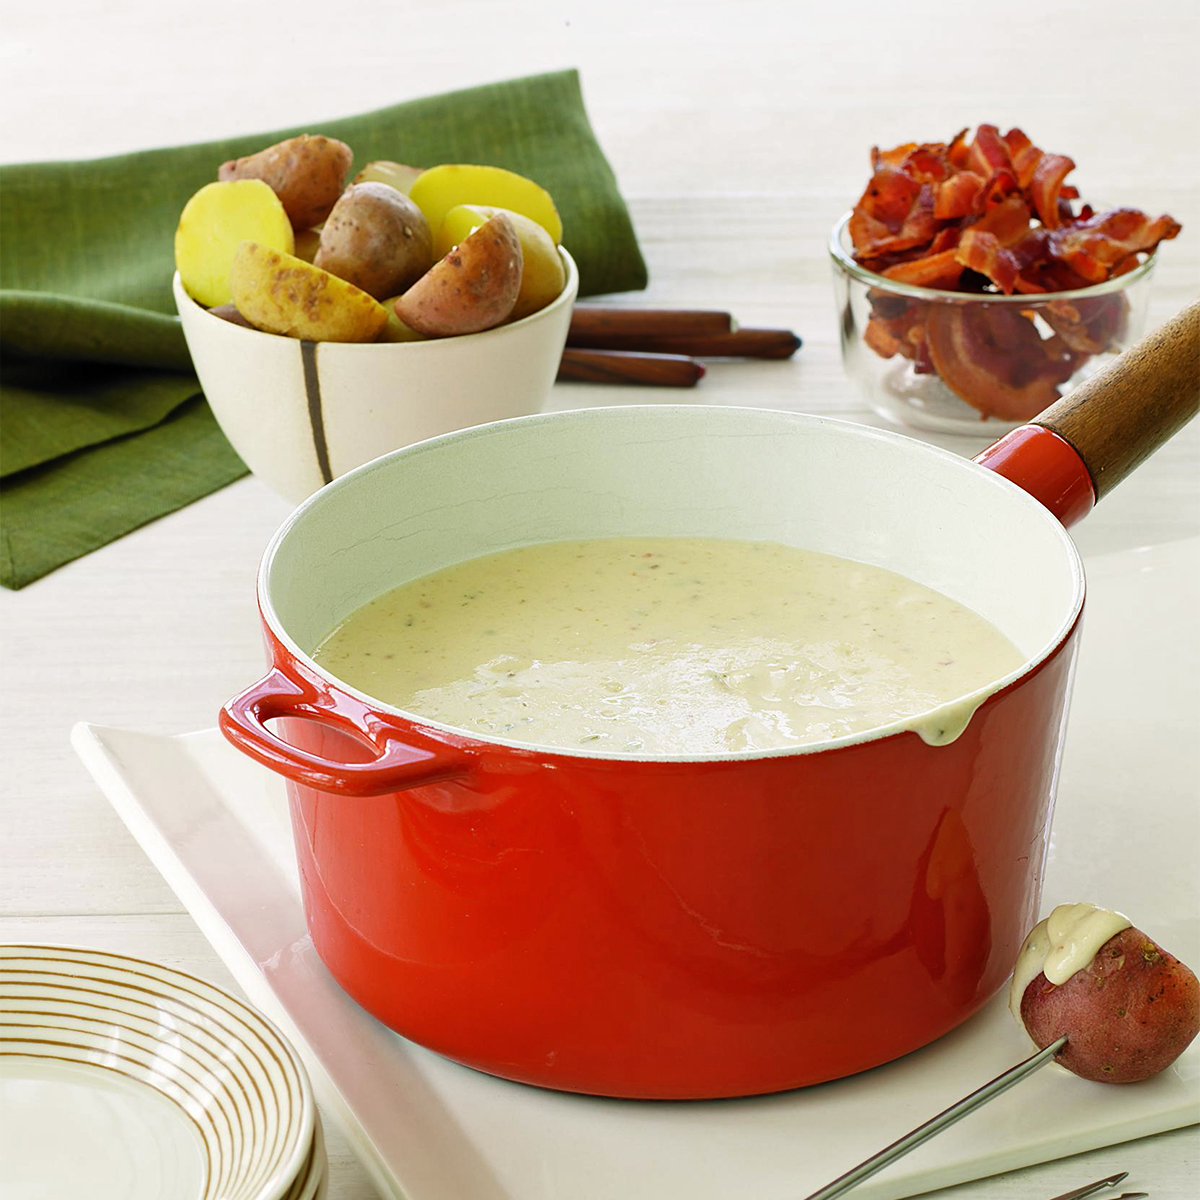 spicy cheese fondue